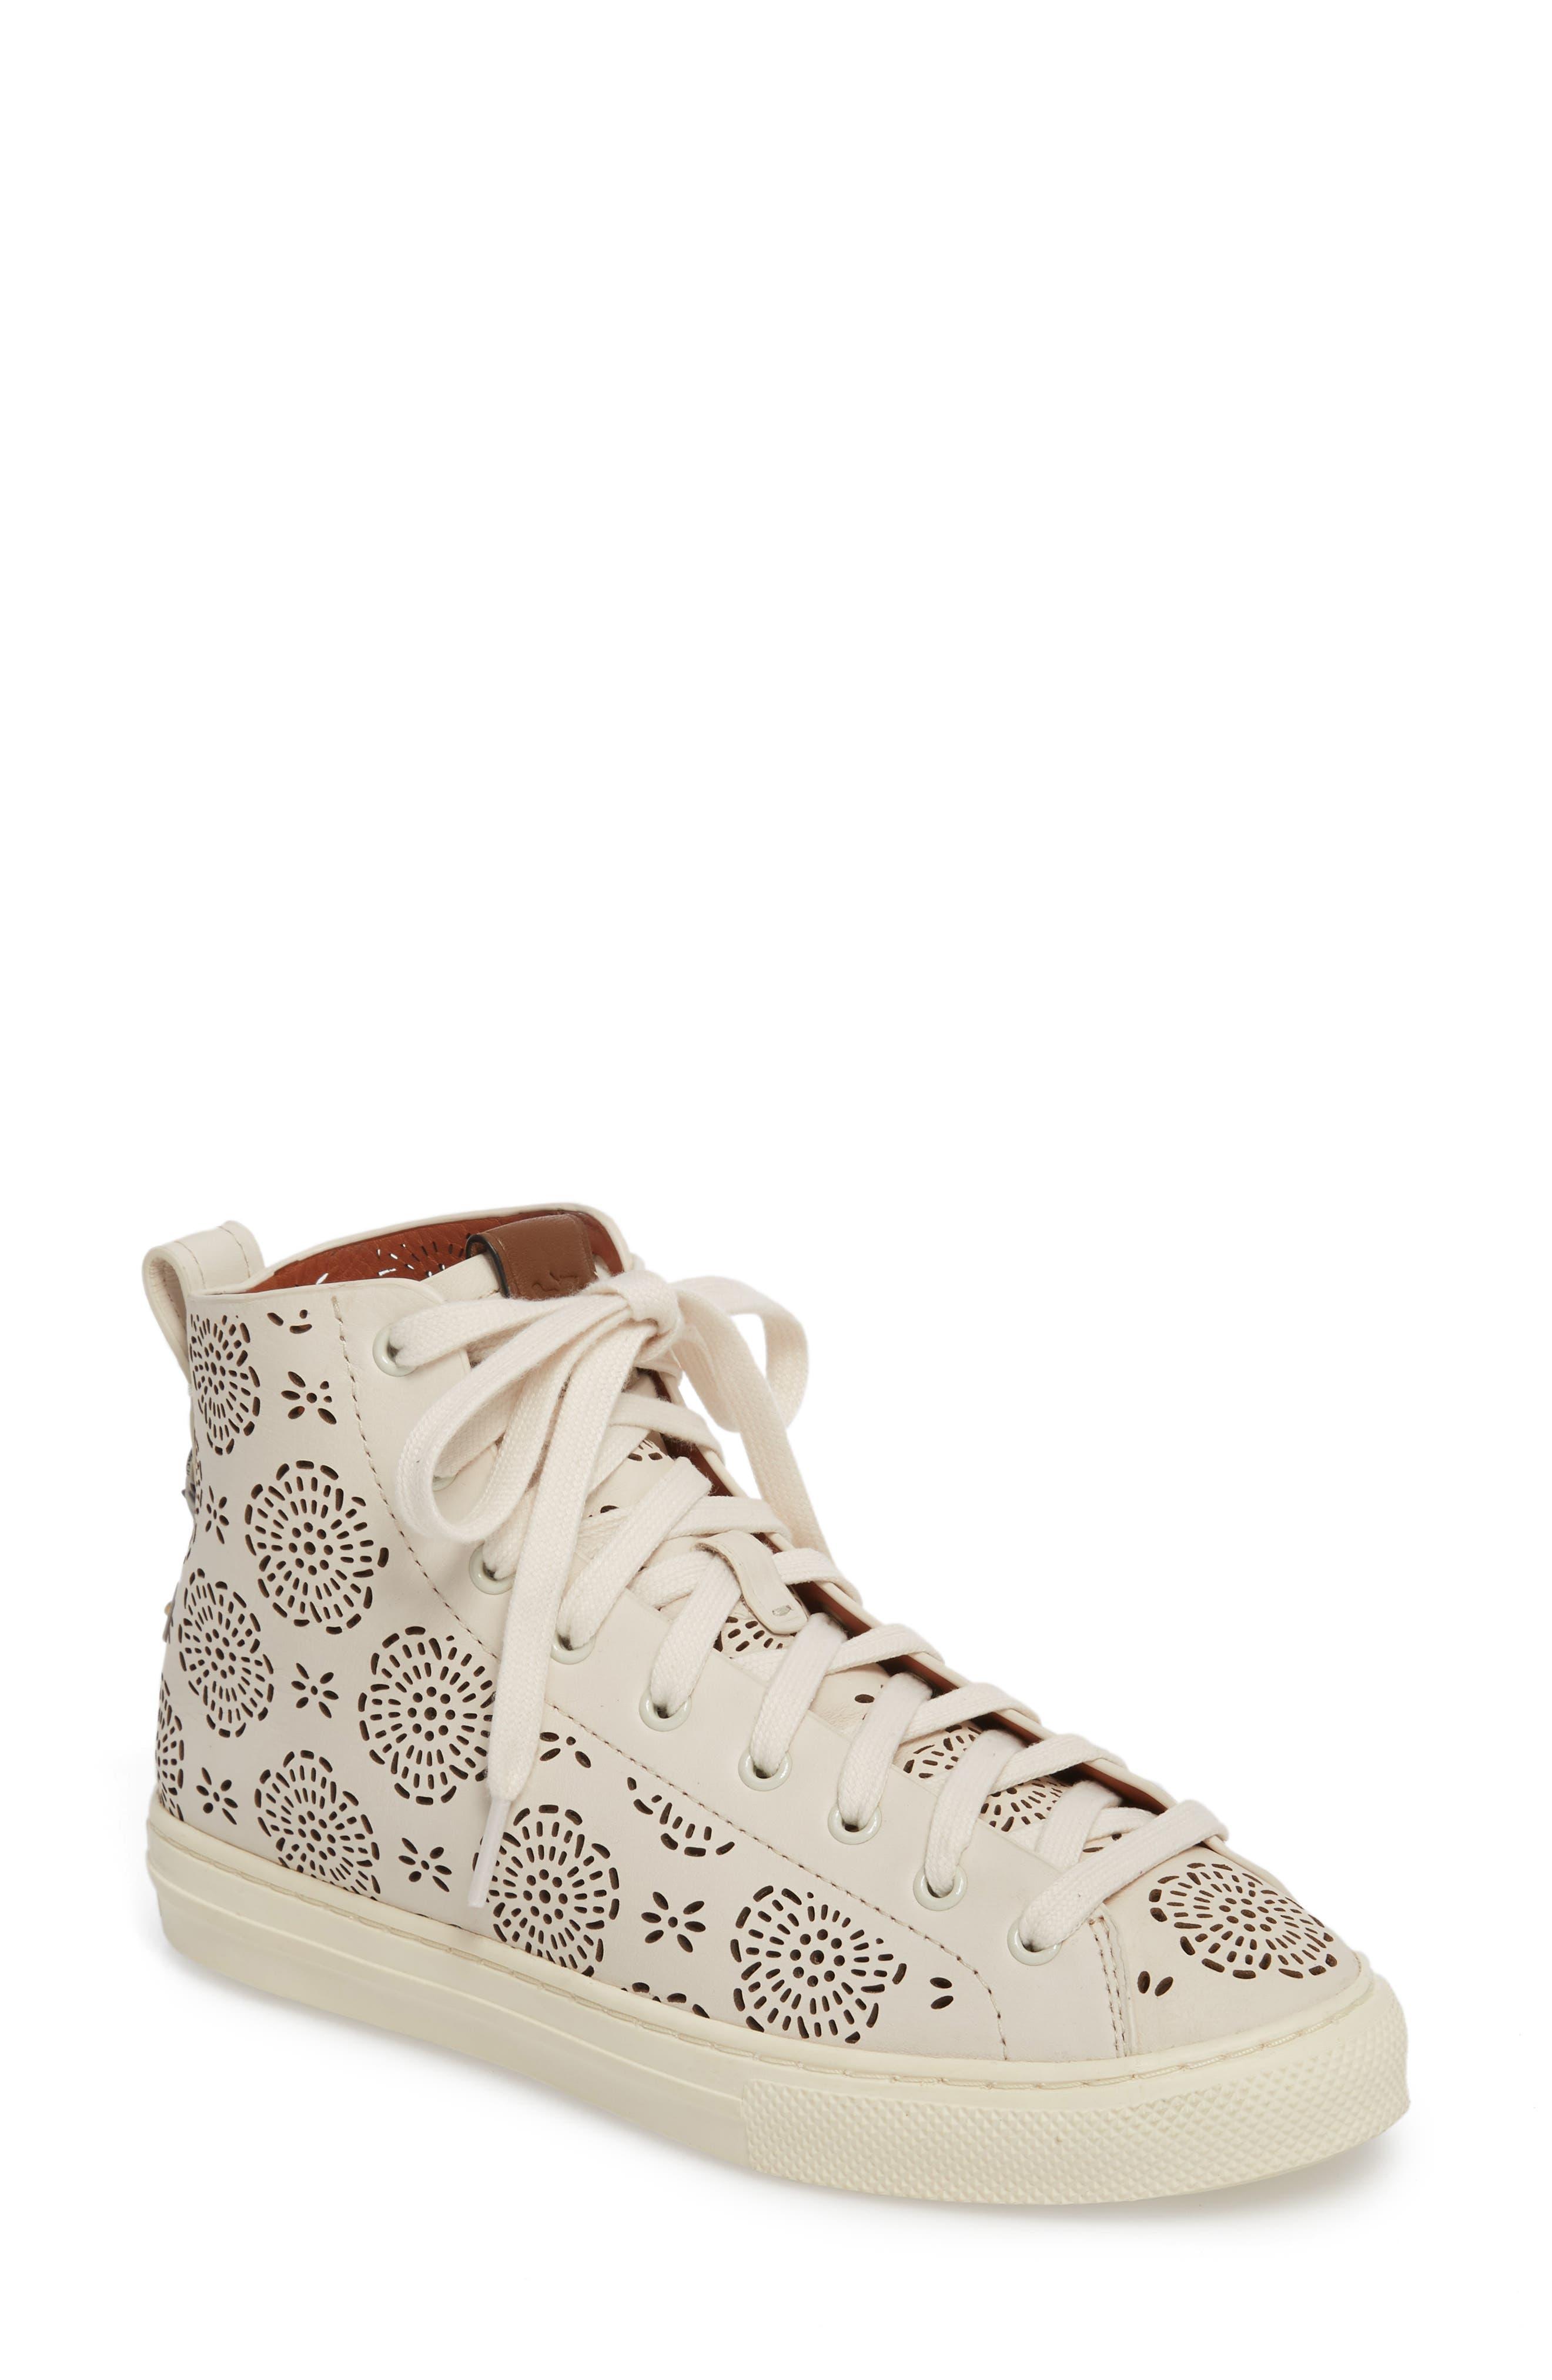 Tea Rose Cutout High Top Sneaker,                             Main thumbnail 1, color,                             Chalk Leather